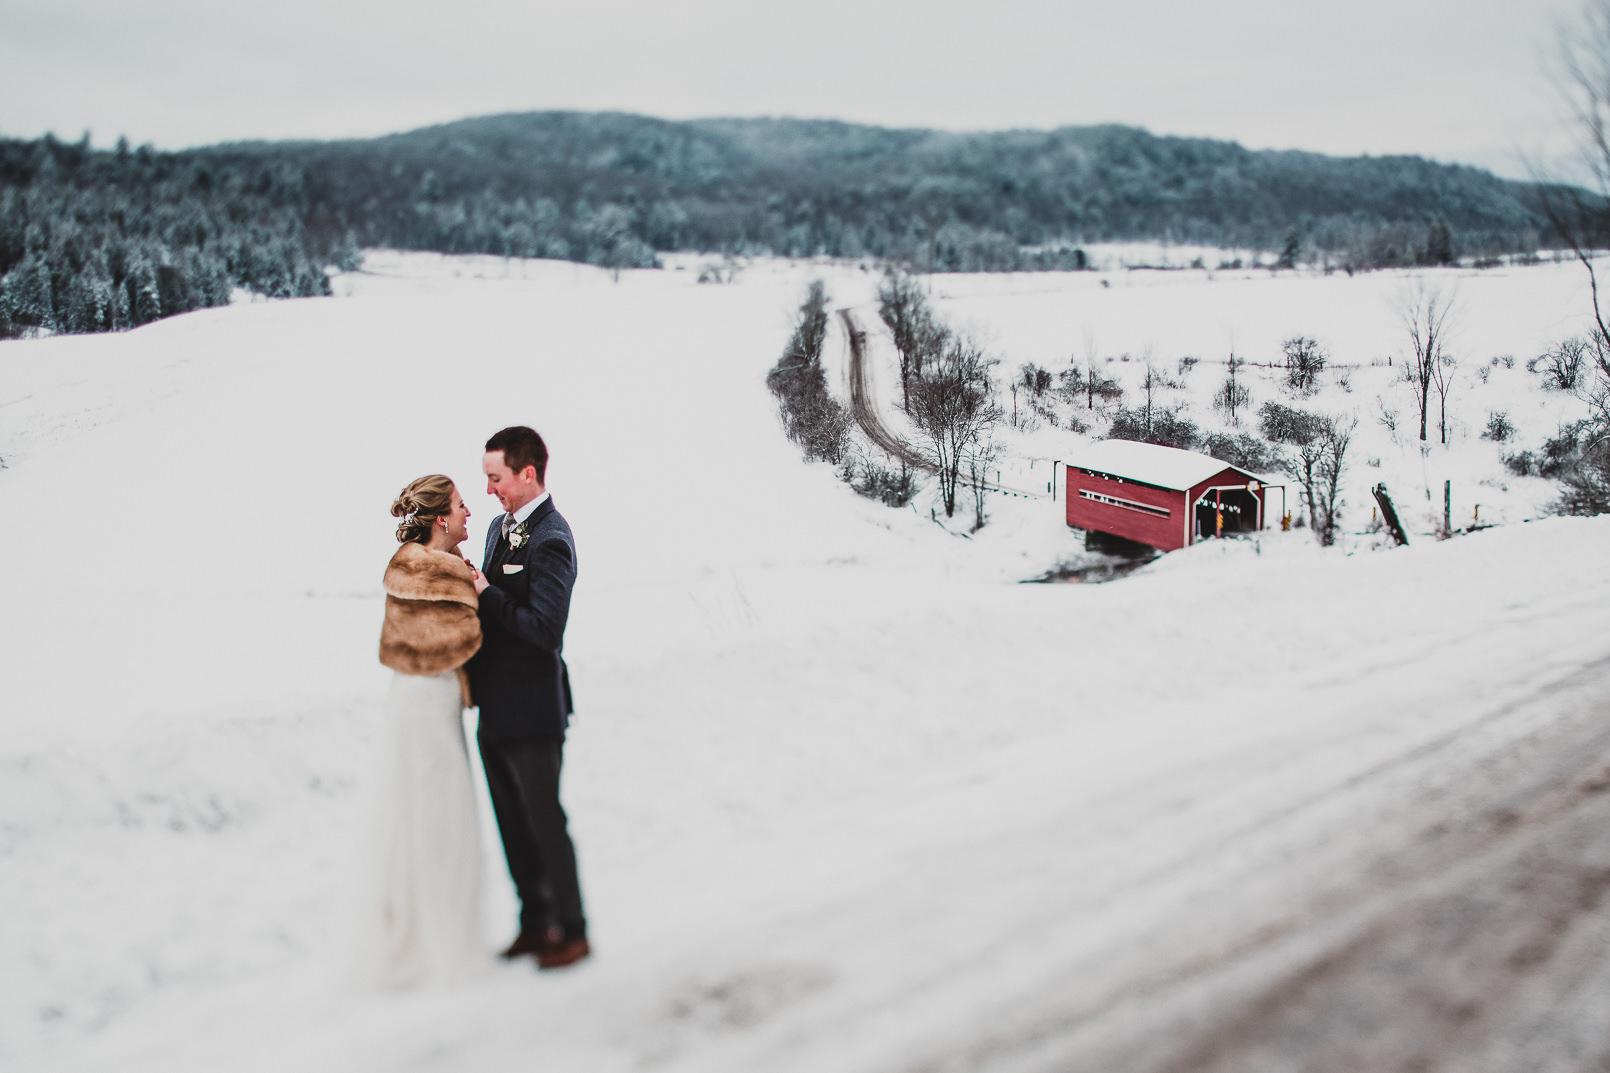 026-Jonathan-Kuhn-Photography-Wedding-_mini.jpg